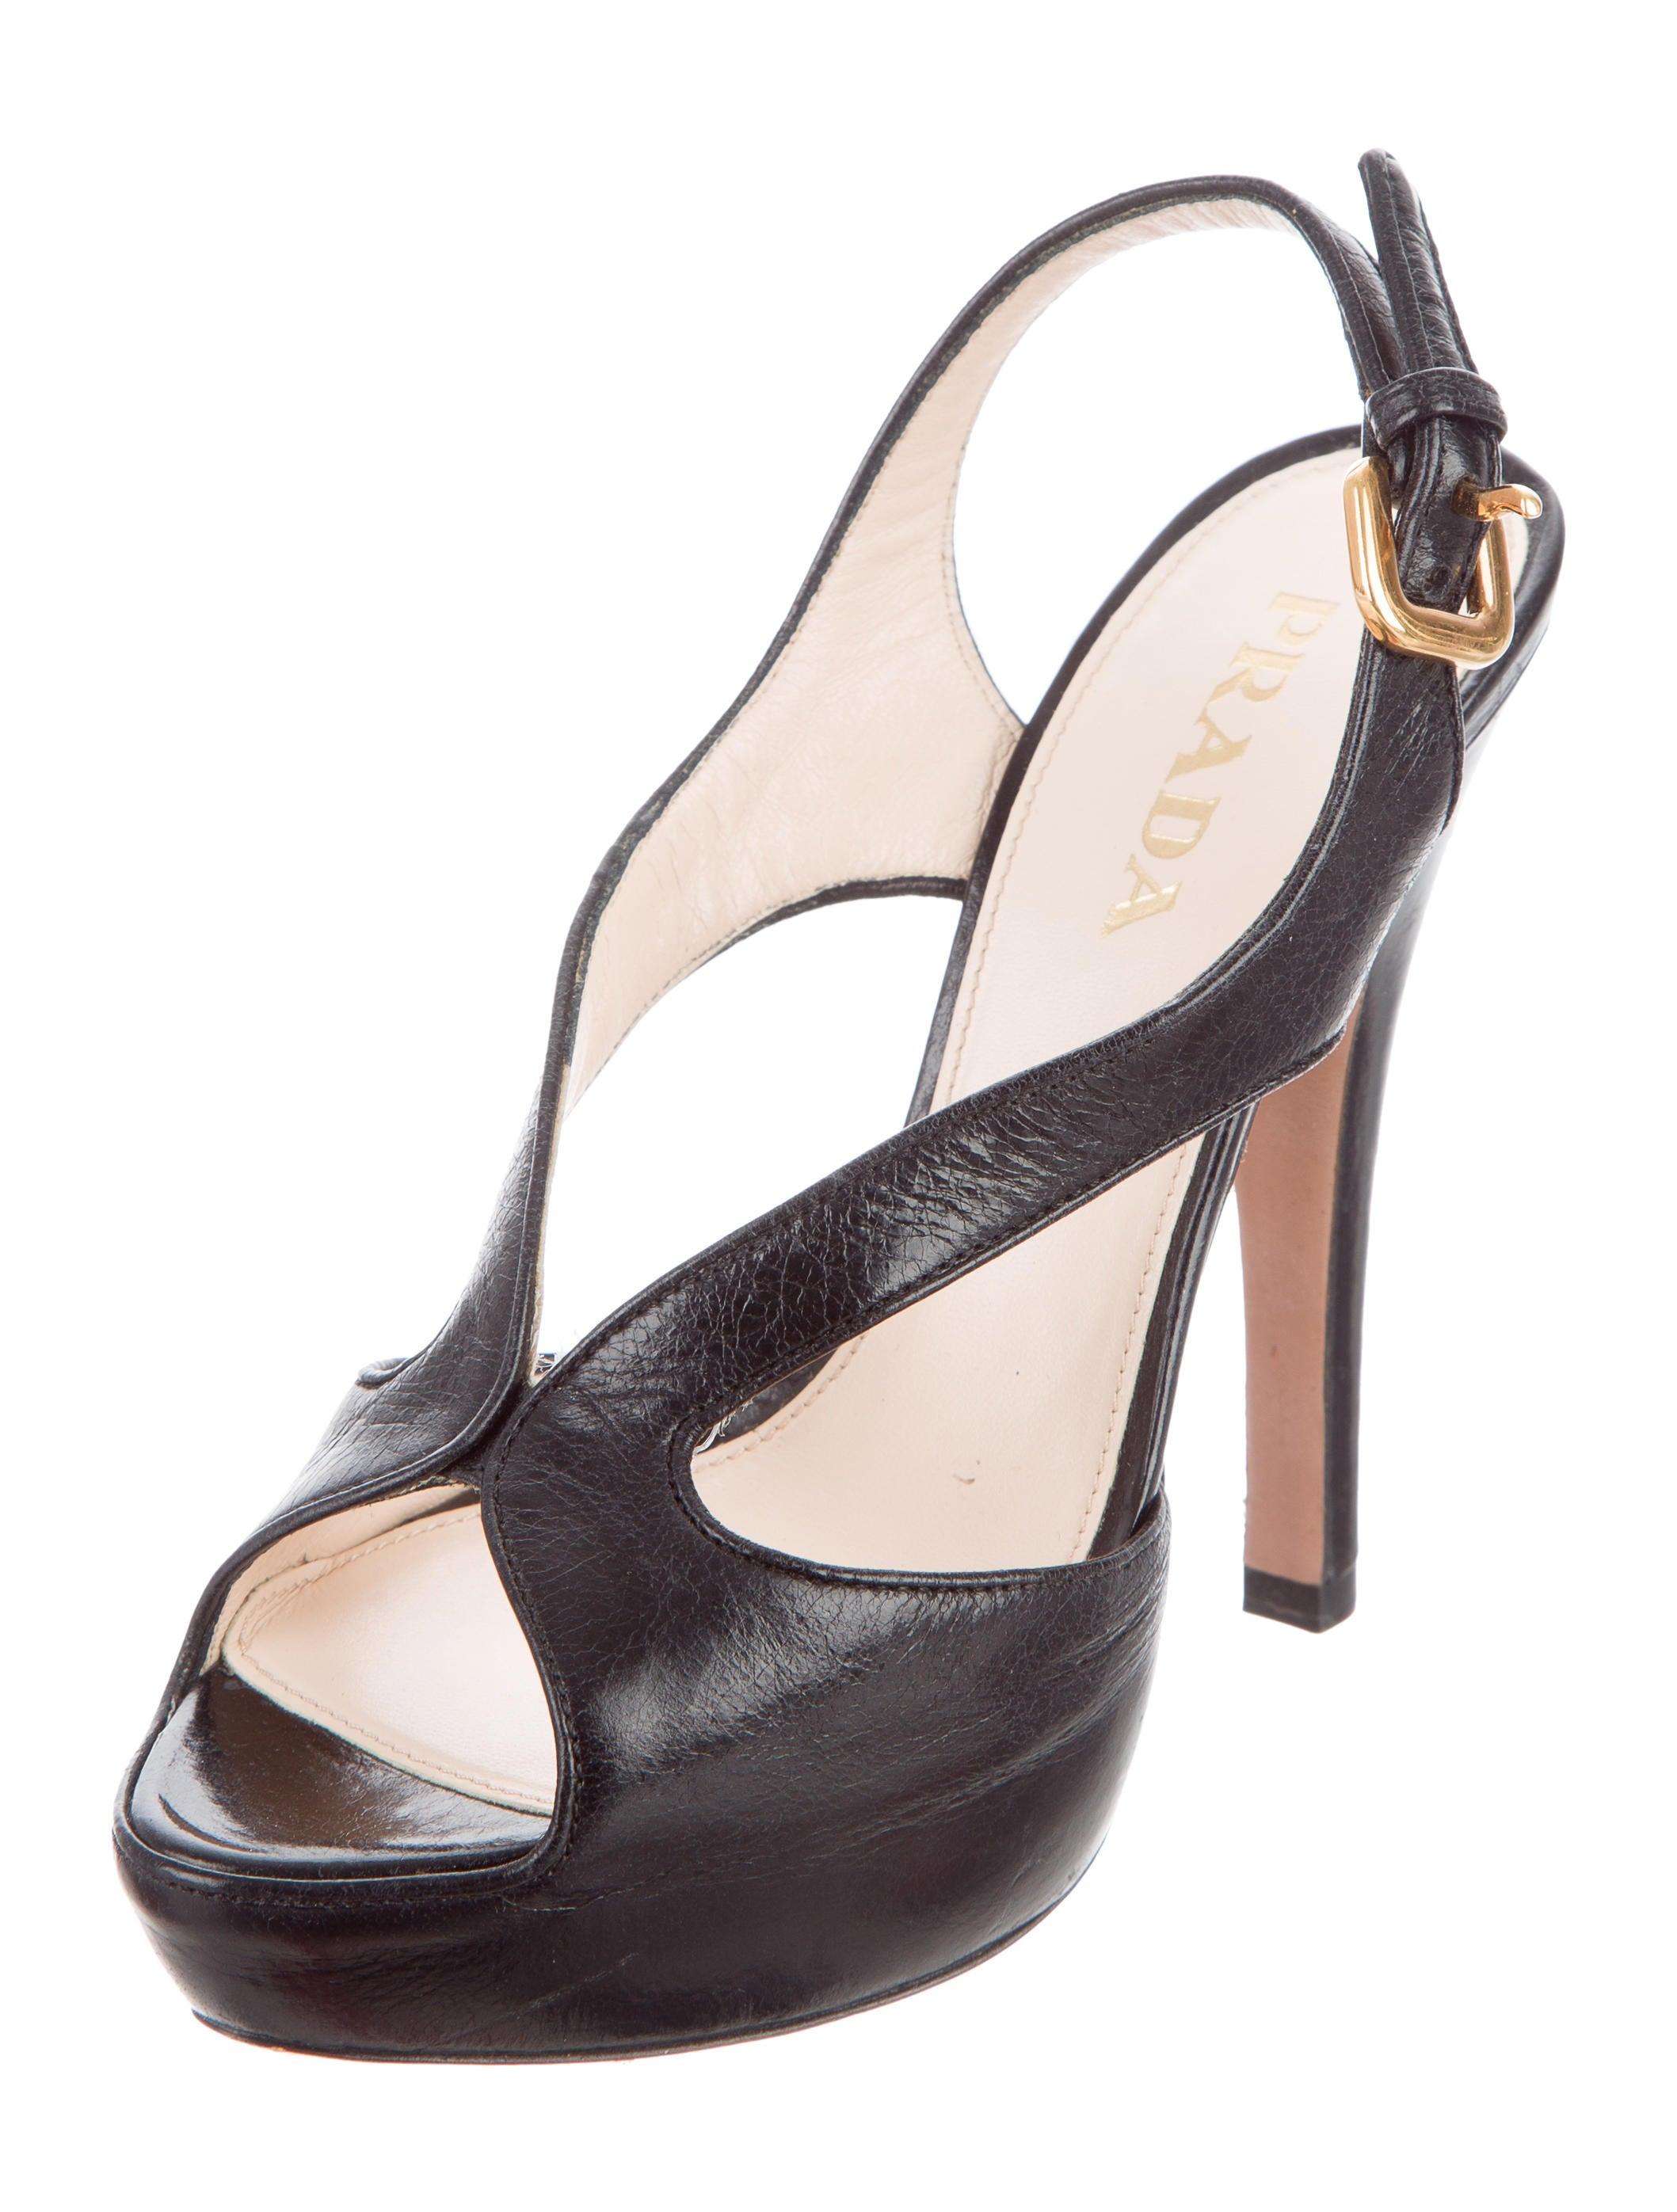 Find great deals on eBay for slingback platform shoes. Shop with confidence.